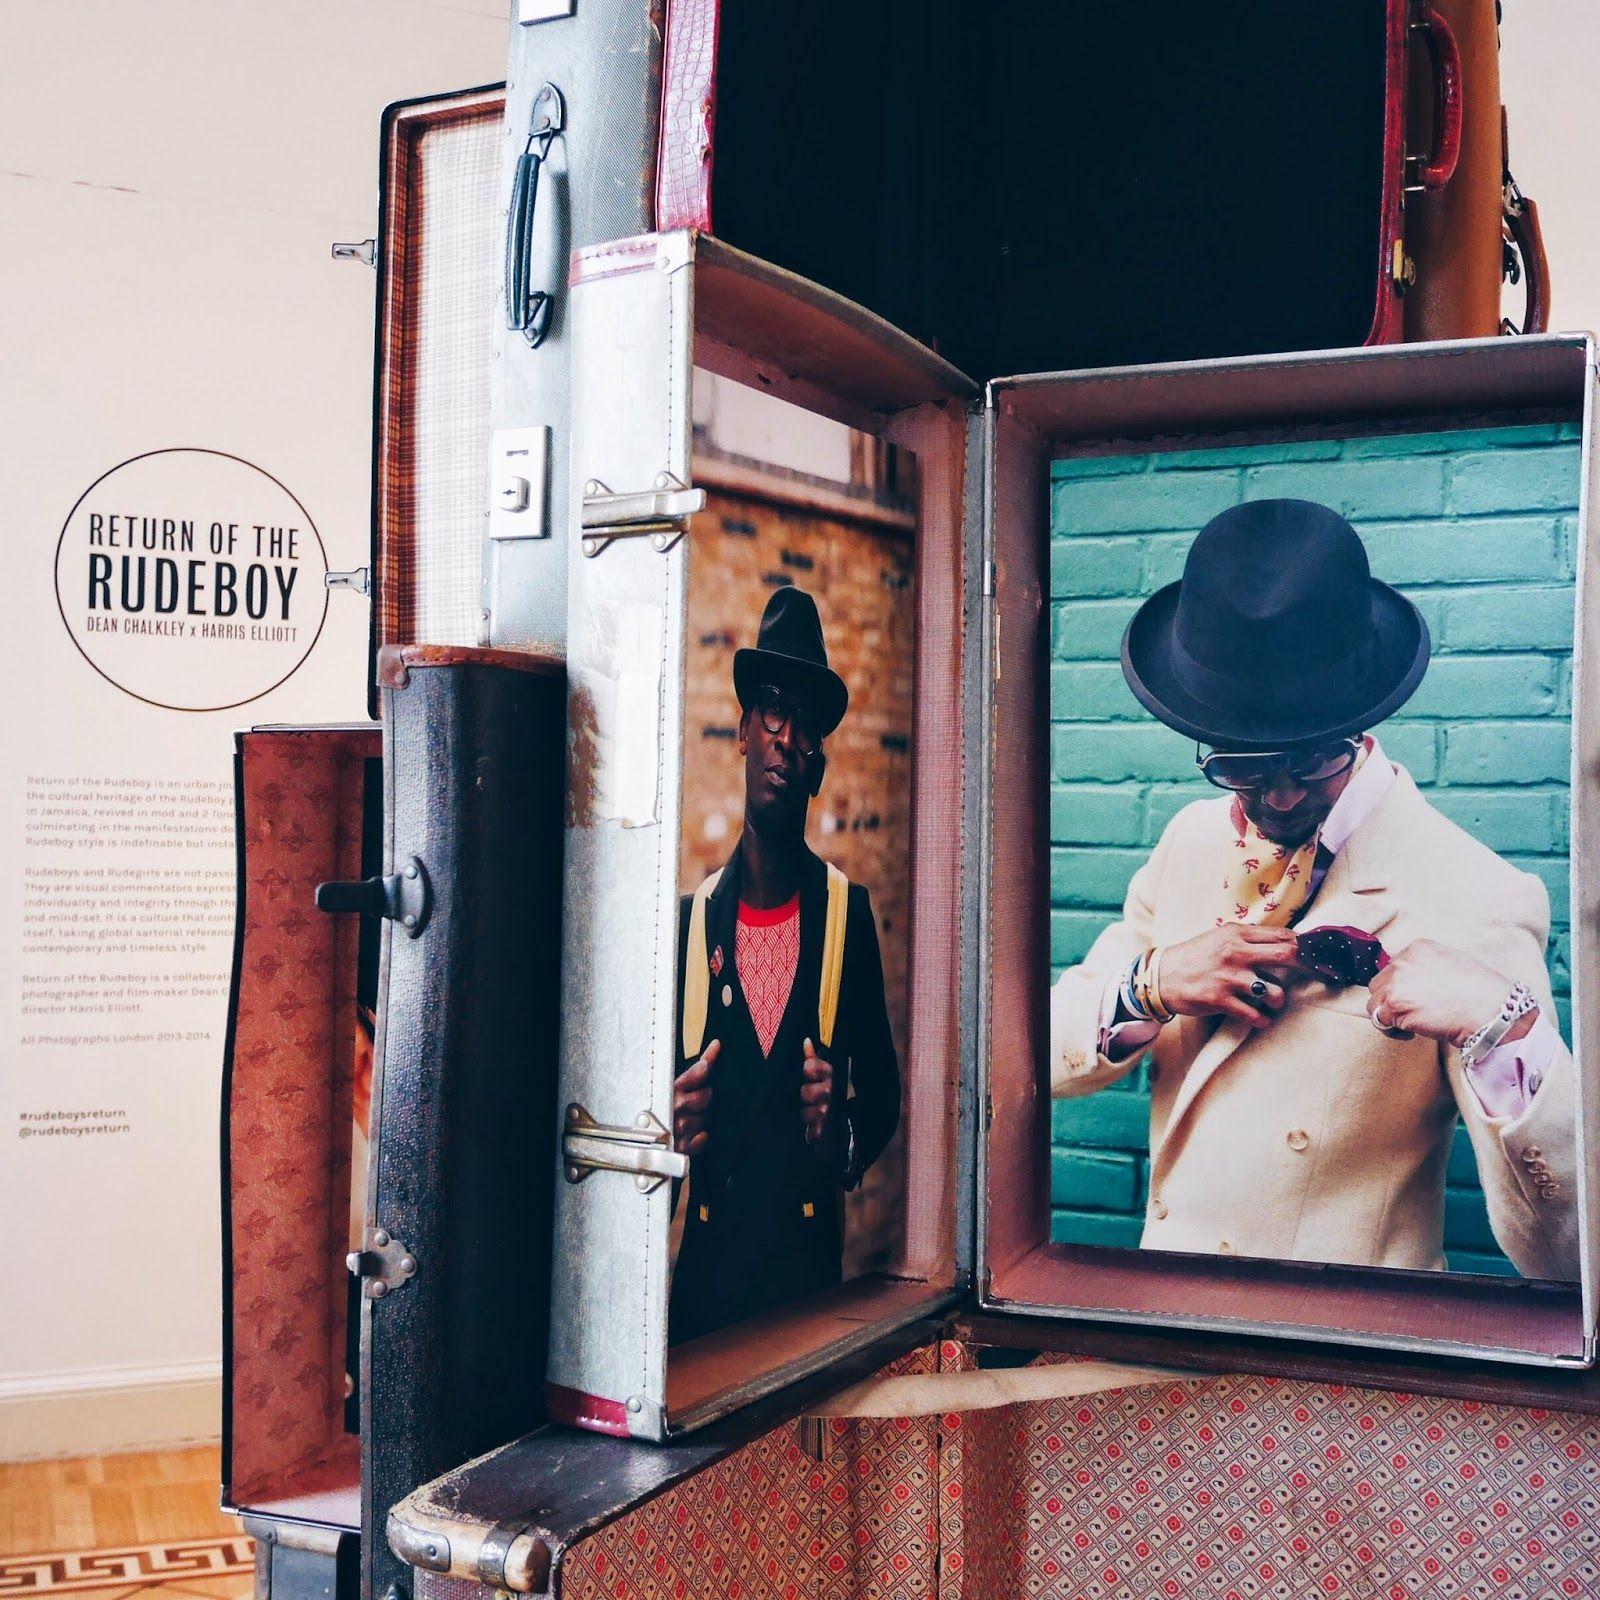 Biscuit Bureau: Return of the Rudeboy, Somerset House